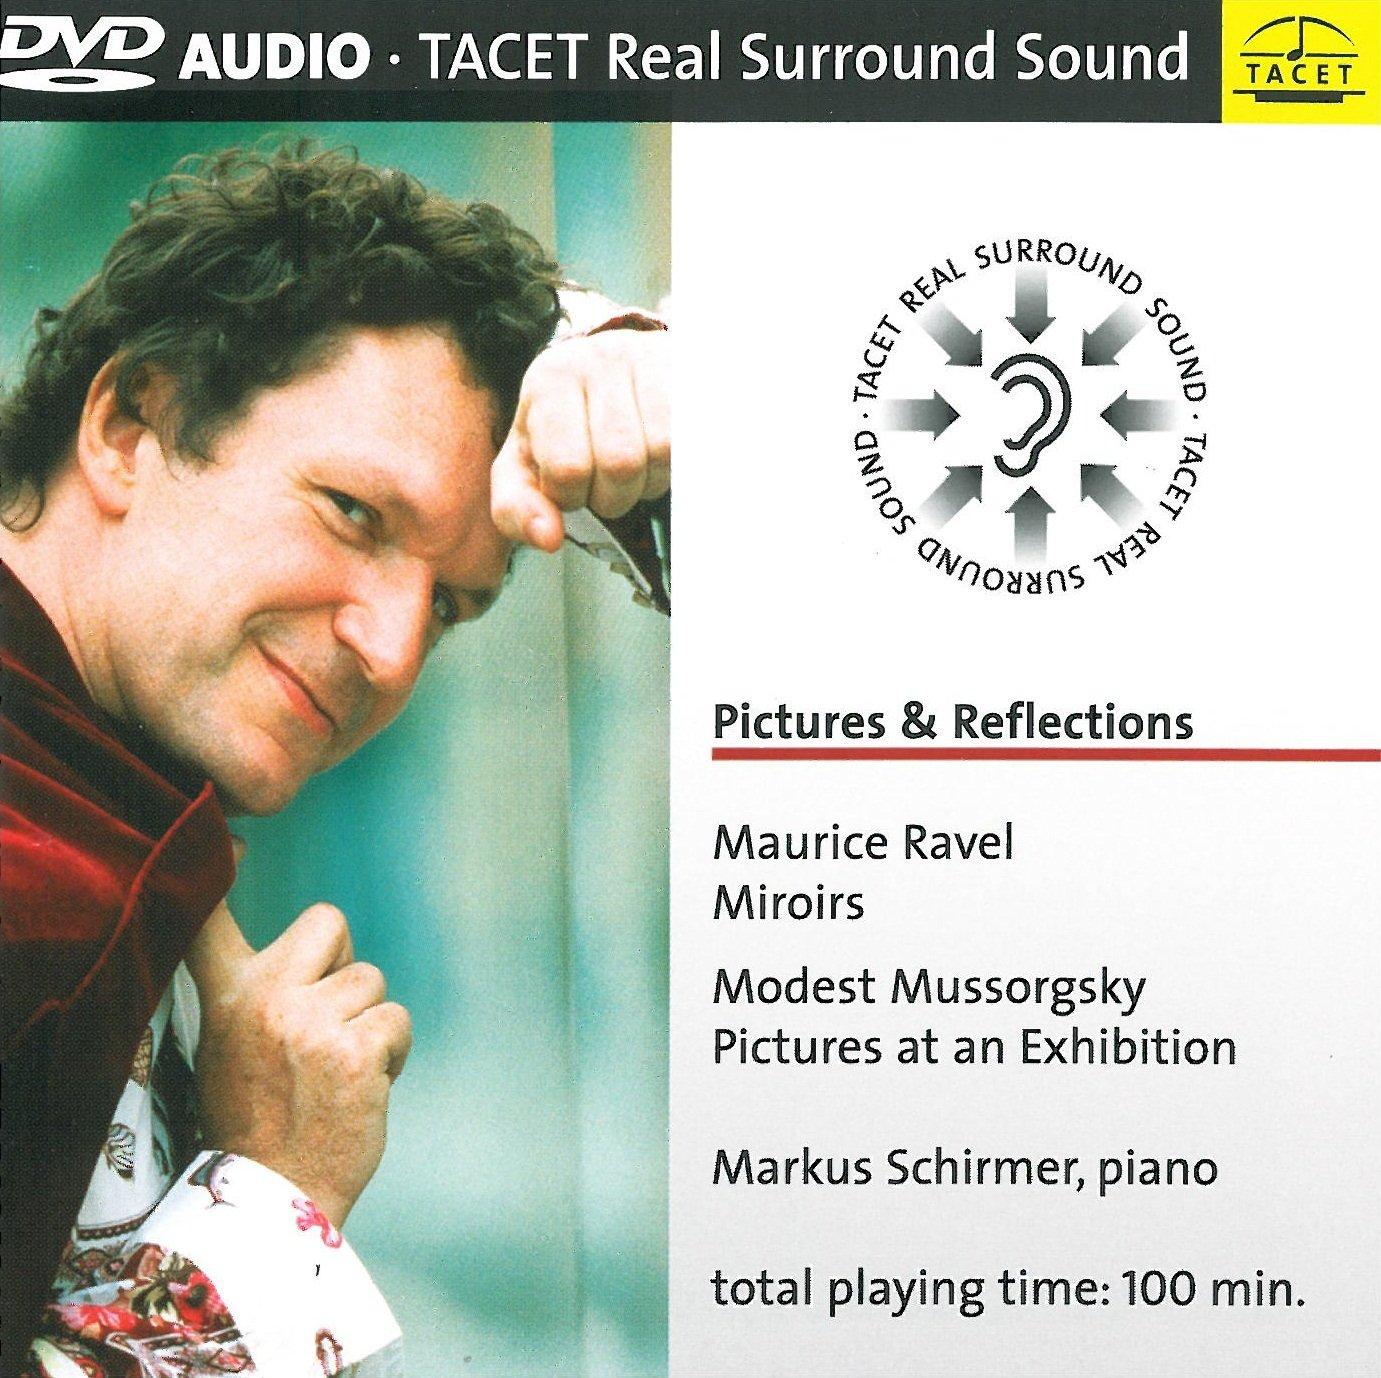 SACD : Markus Schirmer - Pictures & Reflections (DVD Audio)